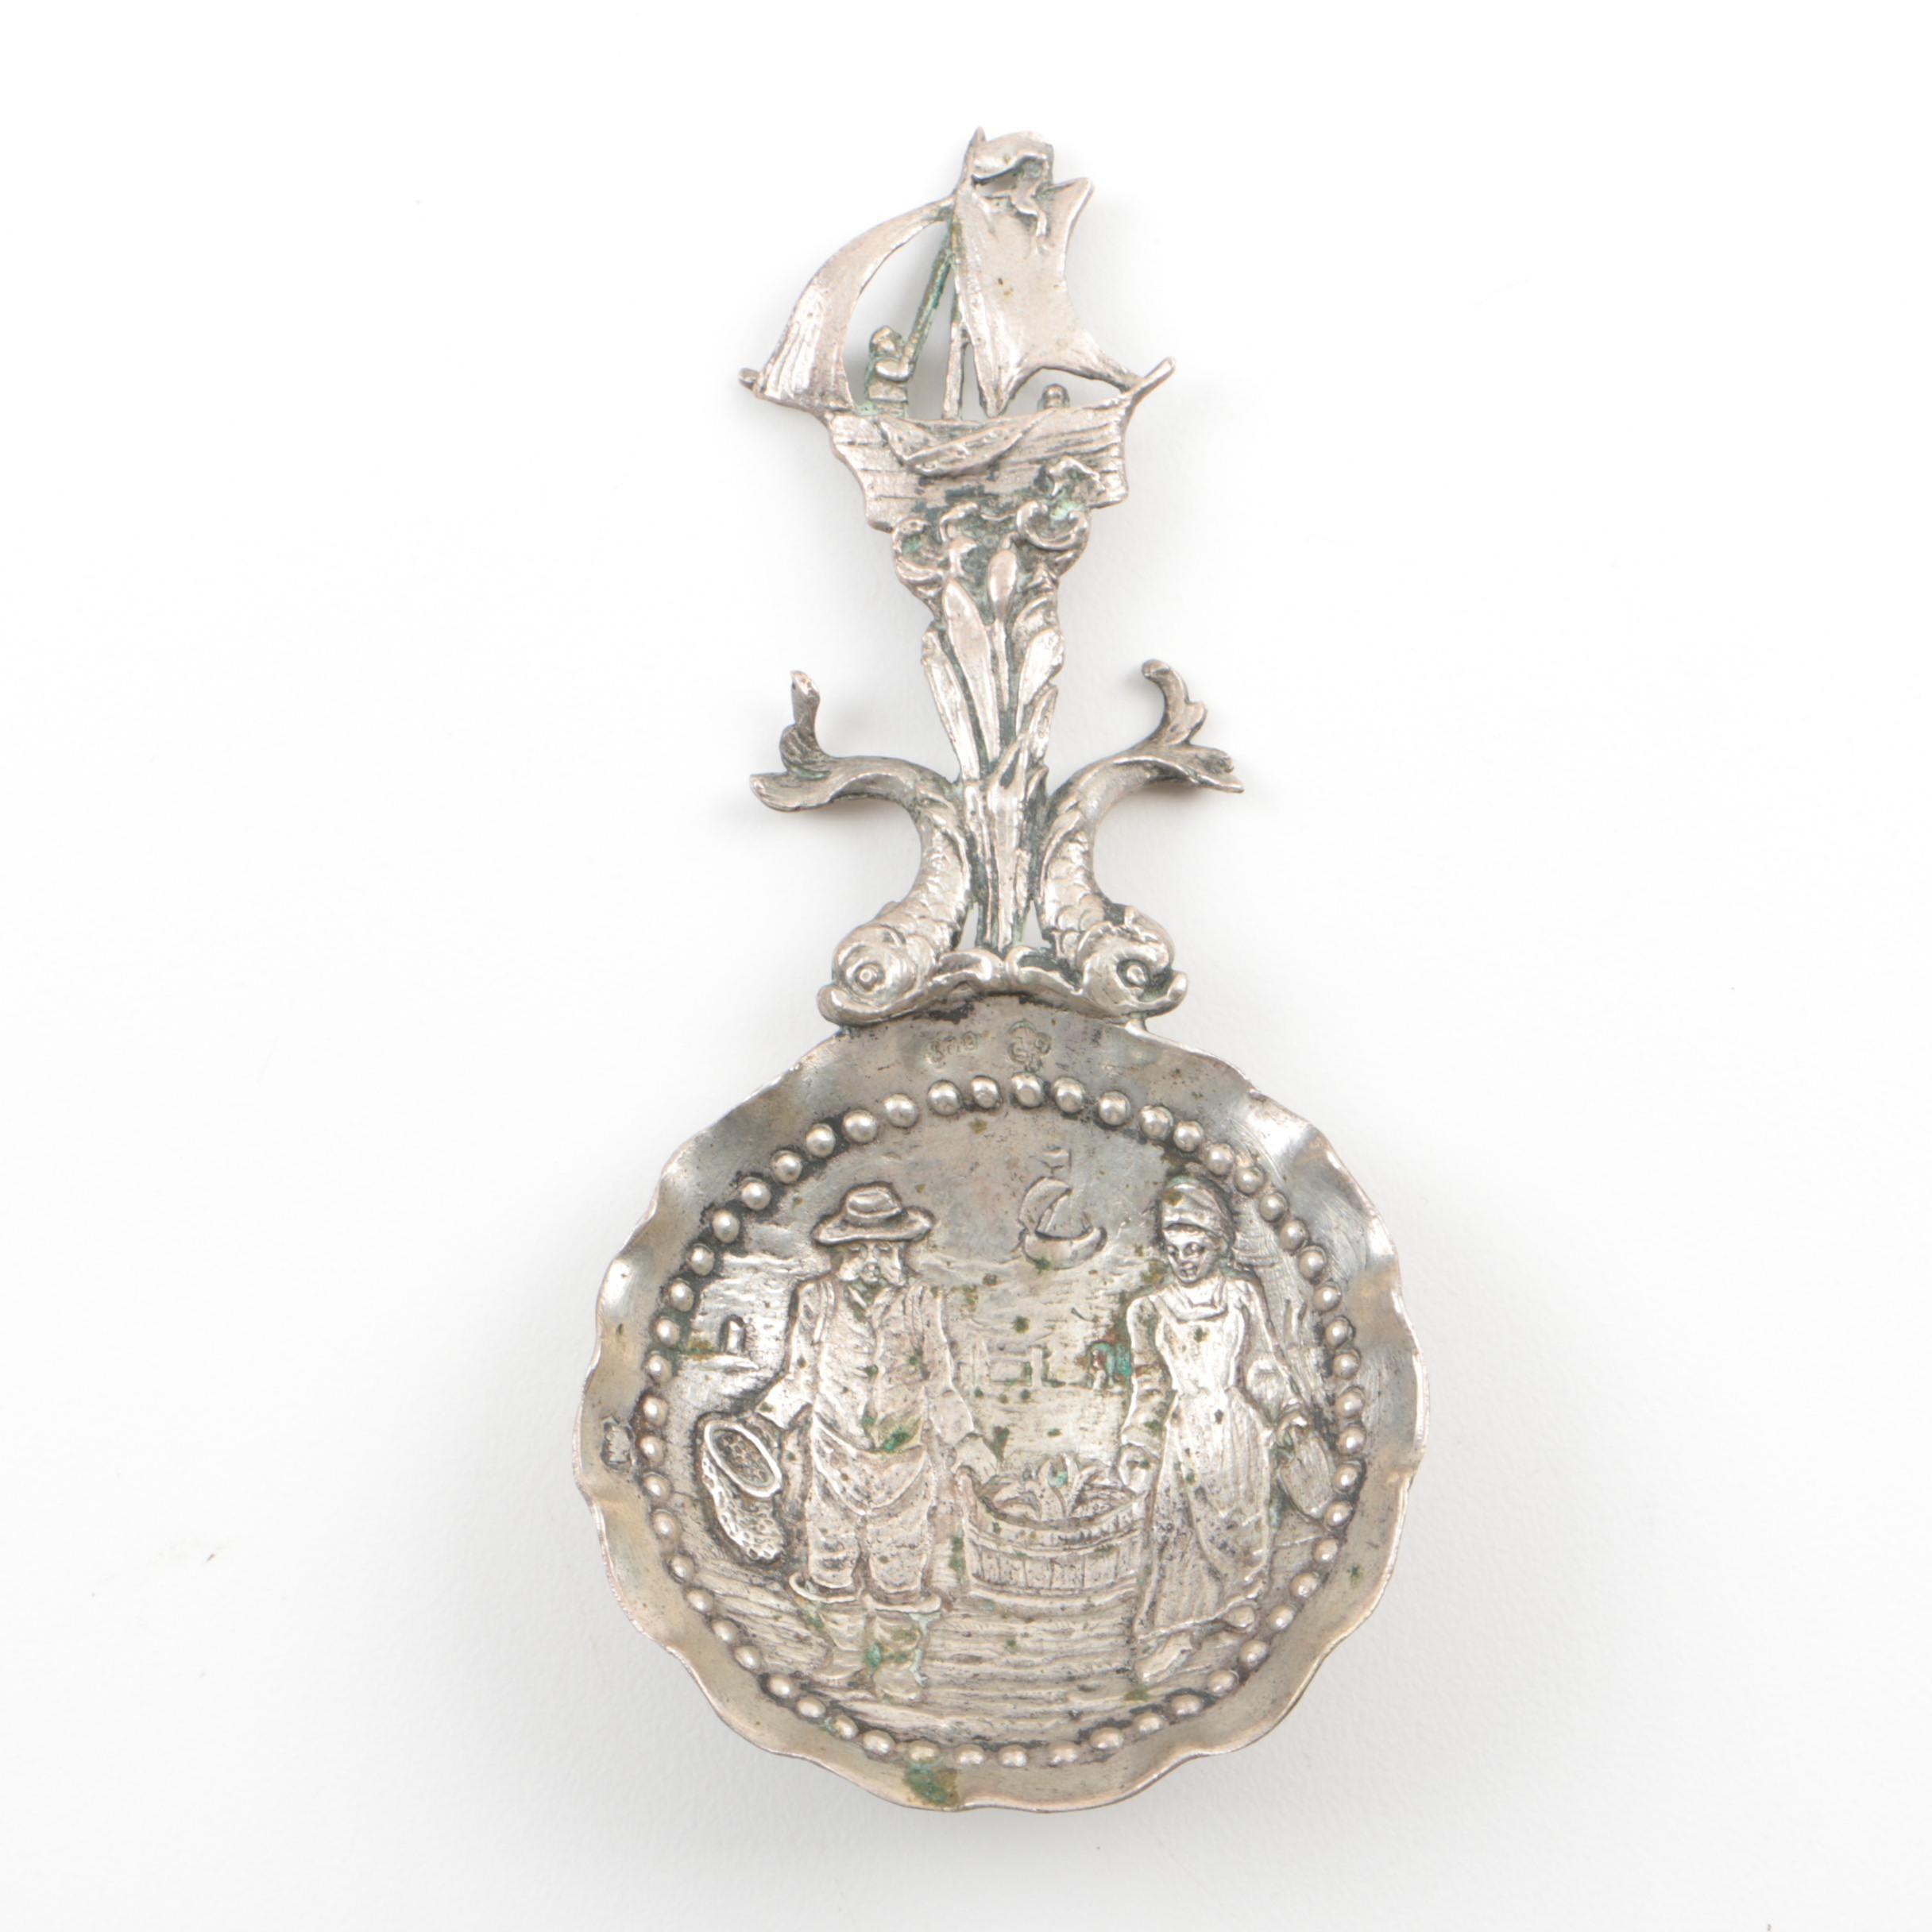 Vintage German Hanau 800 Silver Bon Bon Spoon from Storck & Sinsheimer